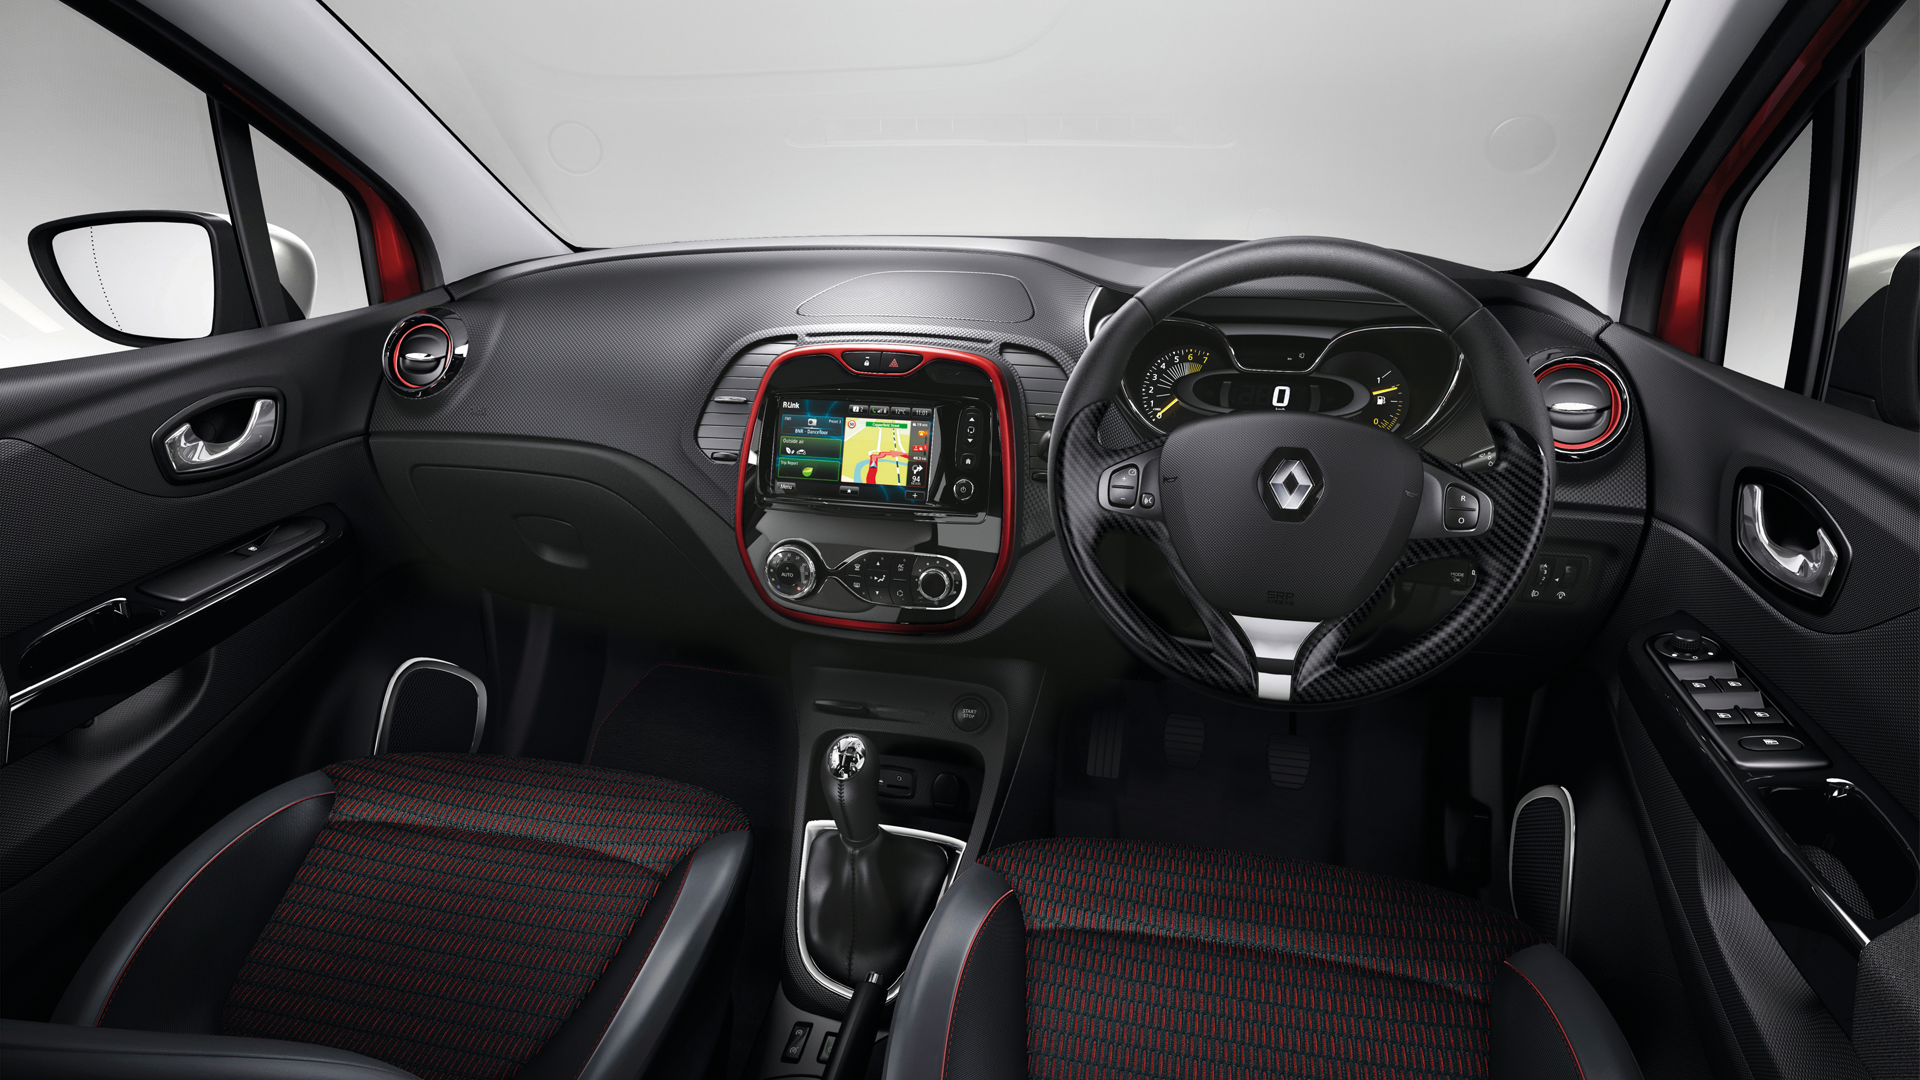 The new Renault Captur interior | Captur (coming soon) | Pinterest